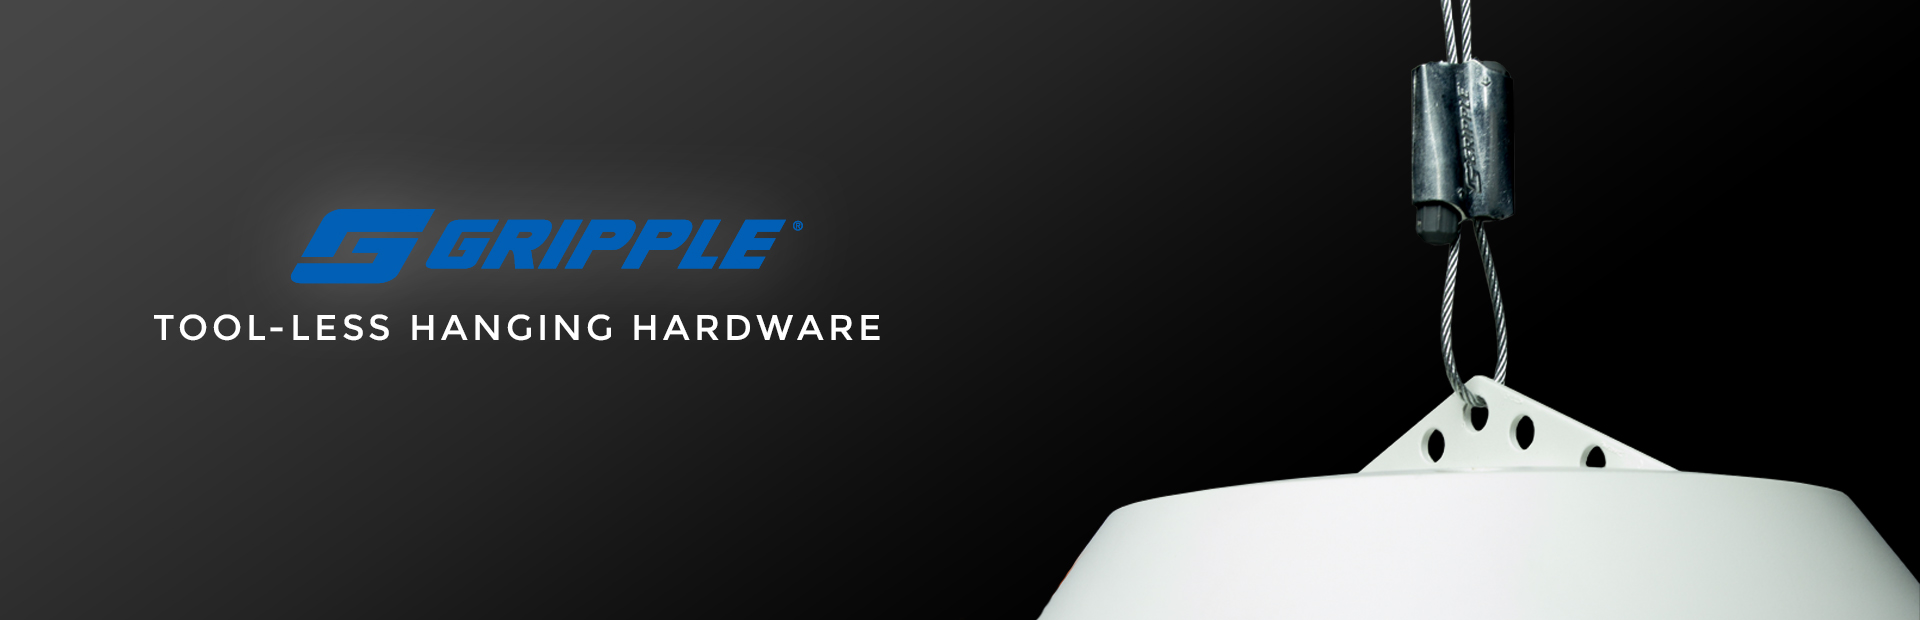 Gripple tool-less hanging hardware